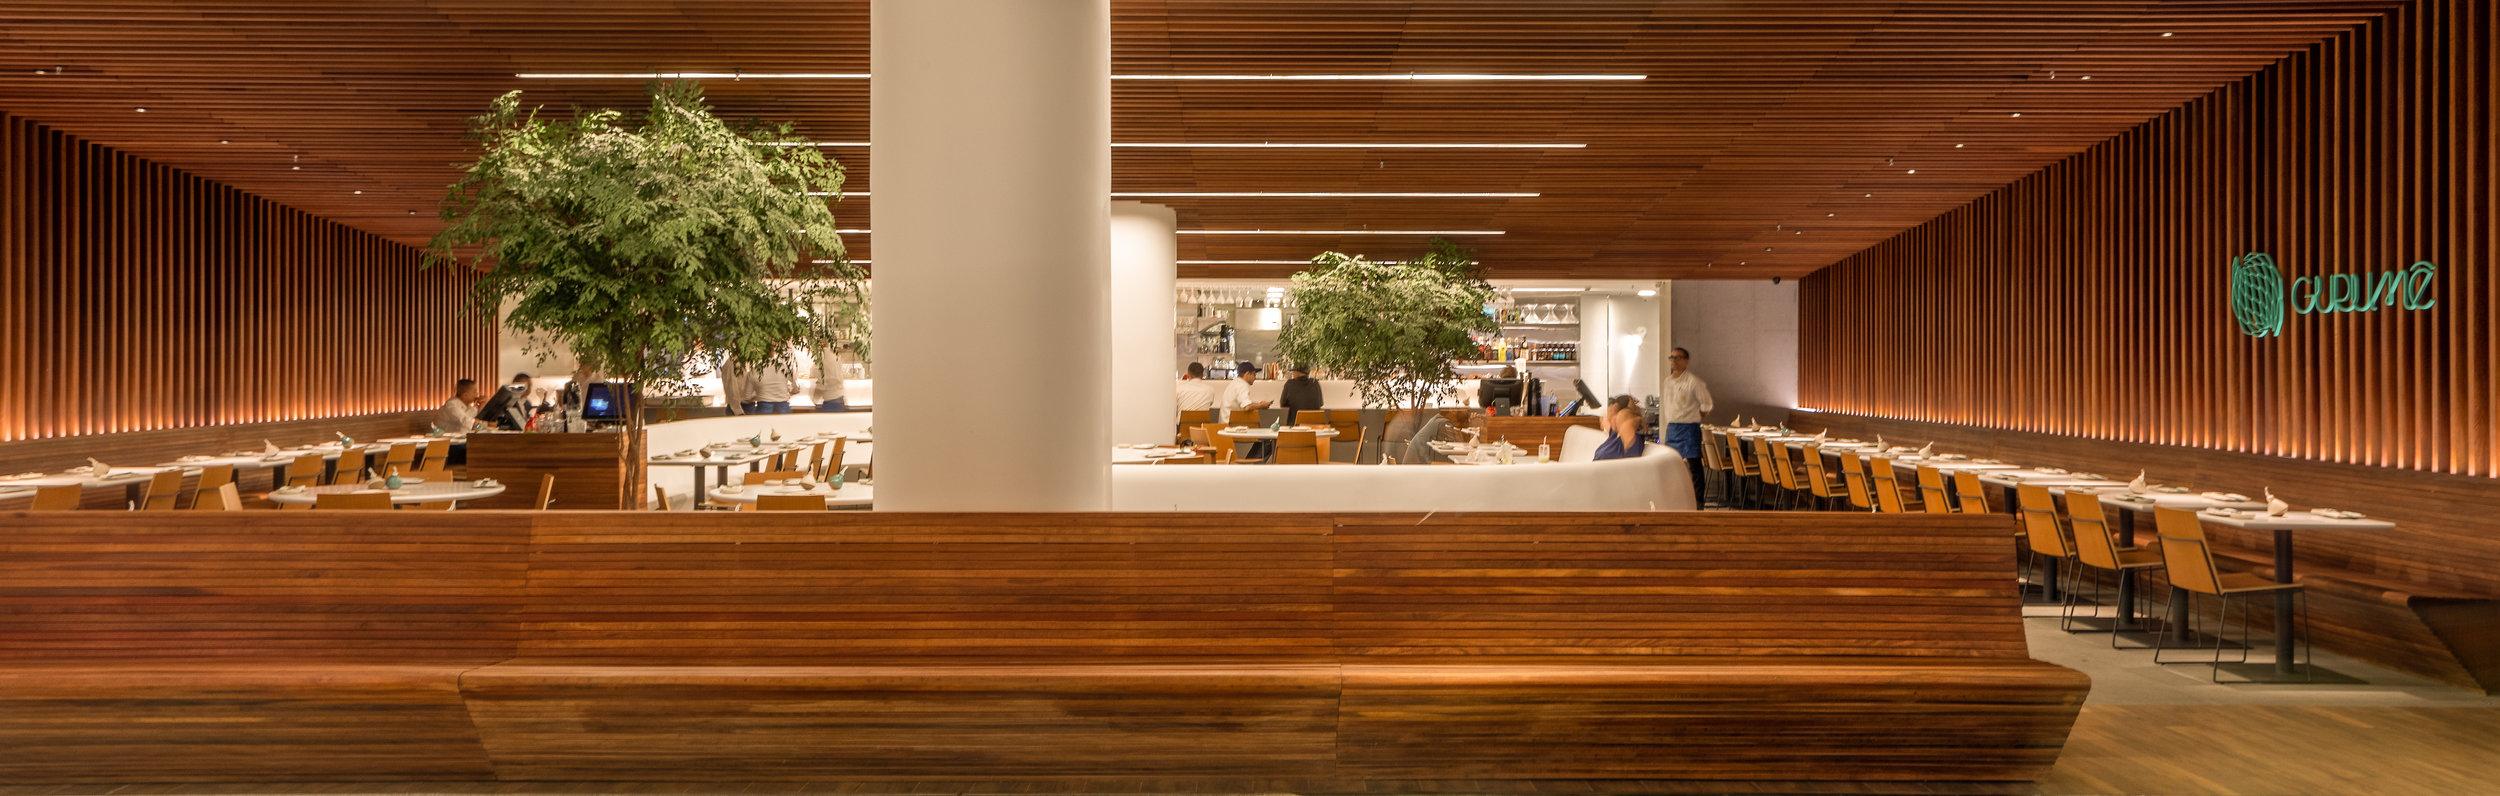 LIGHTSOURCE_Restaurante-Gurume-2019_Bernardes-Arquitetura_Studio-iluz_001.jpg